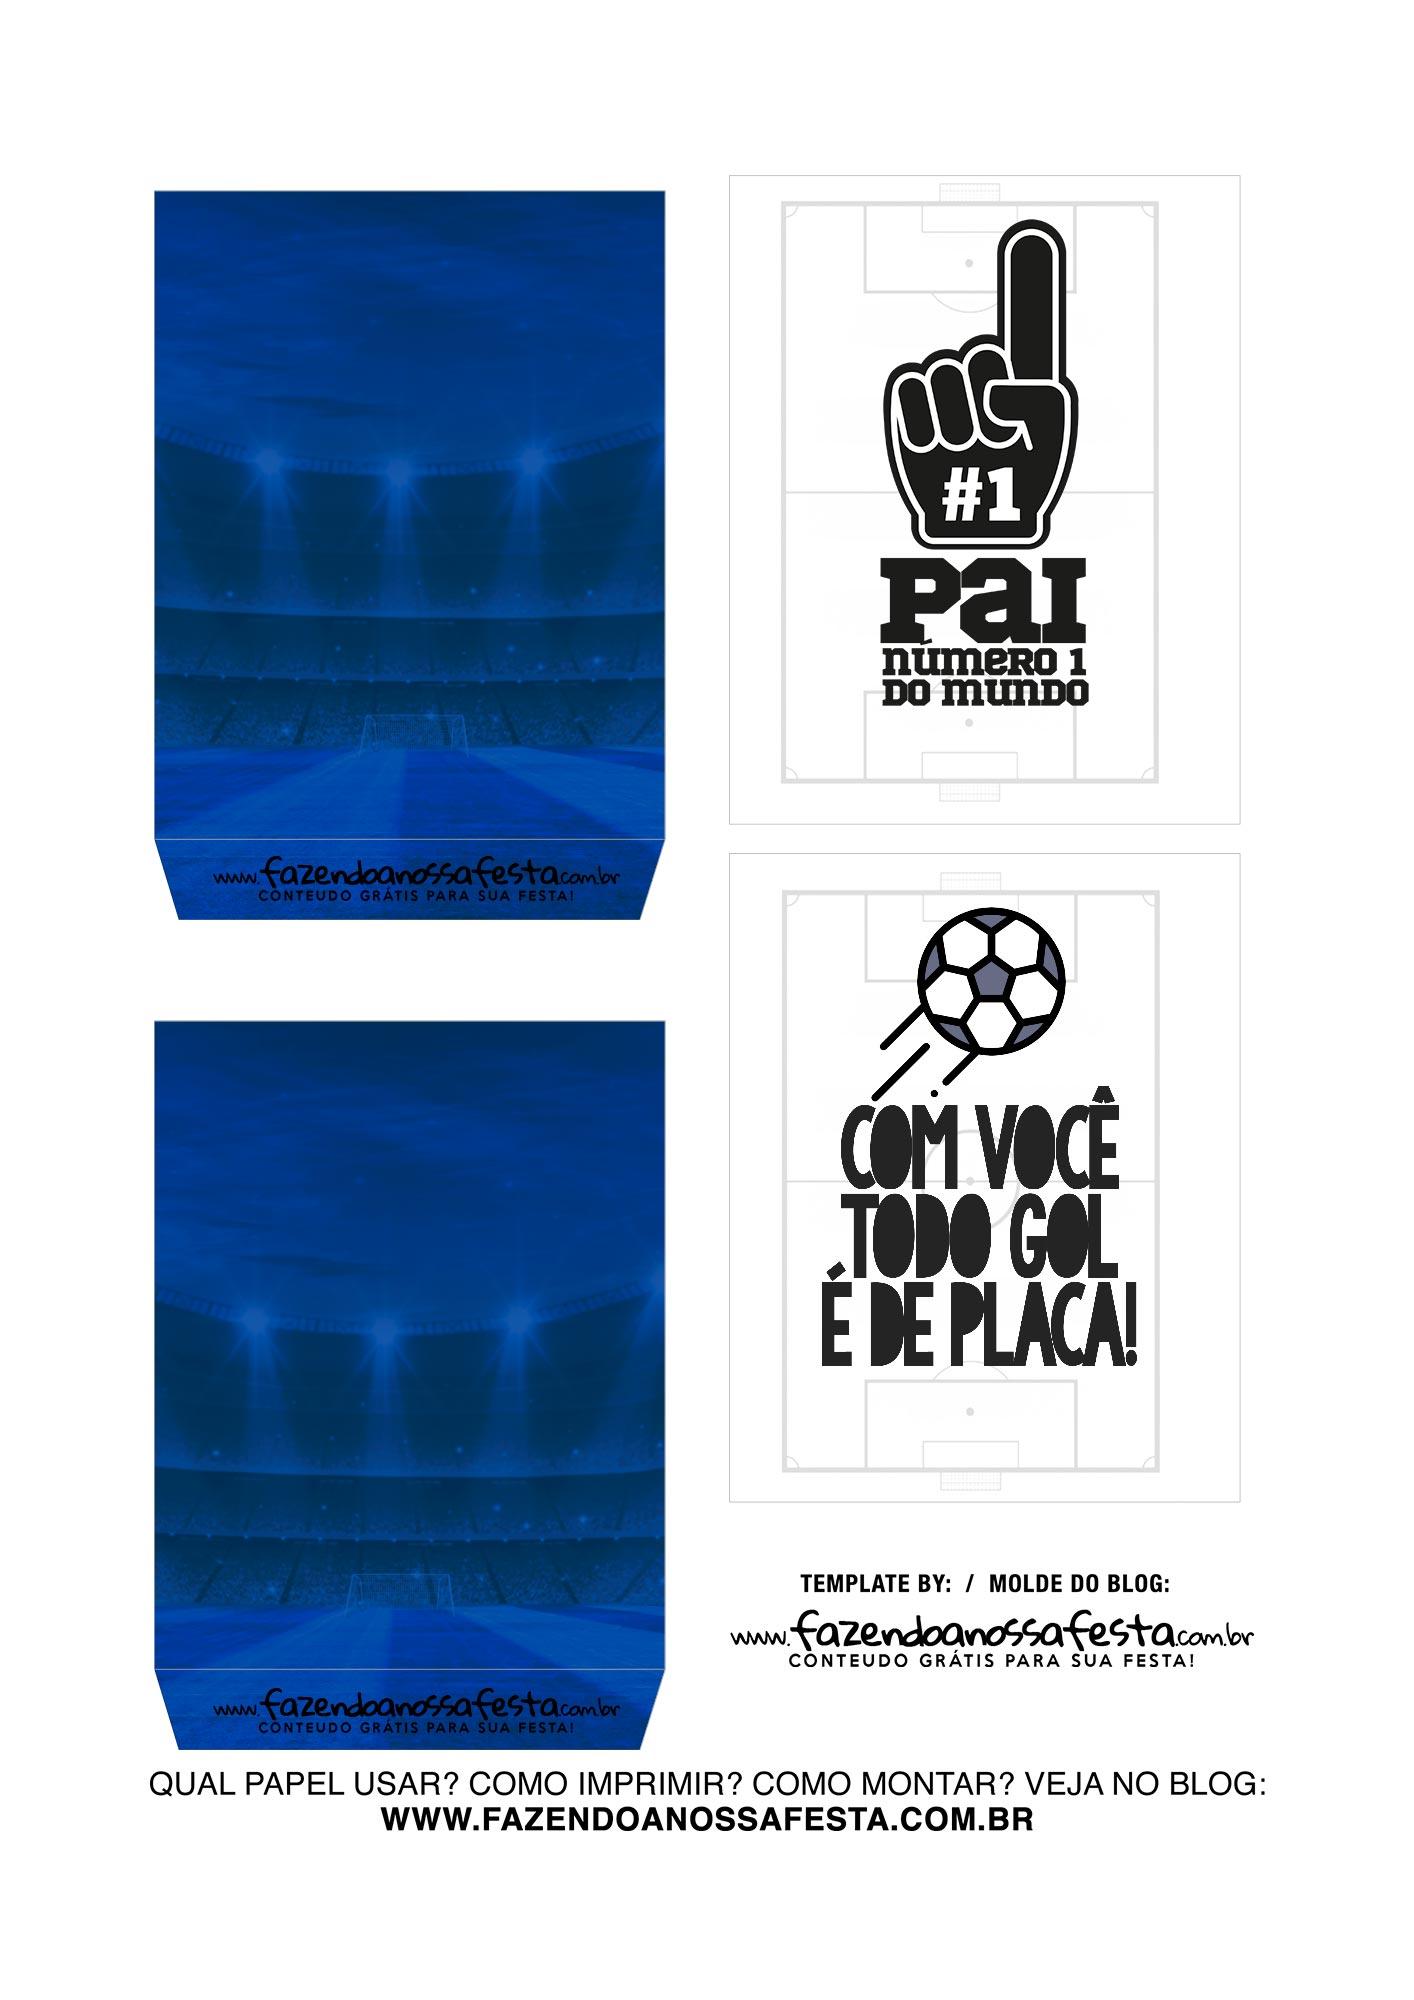 Caixa Explosiva Parte 3 Cruzeiro